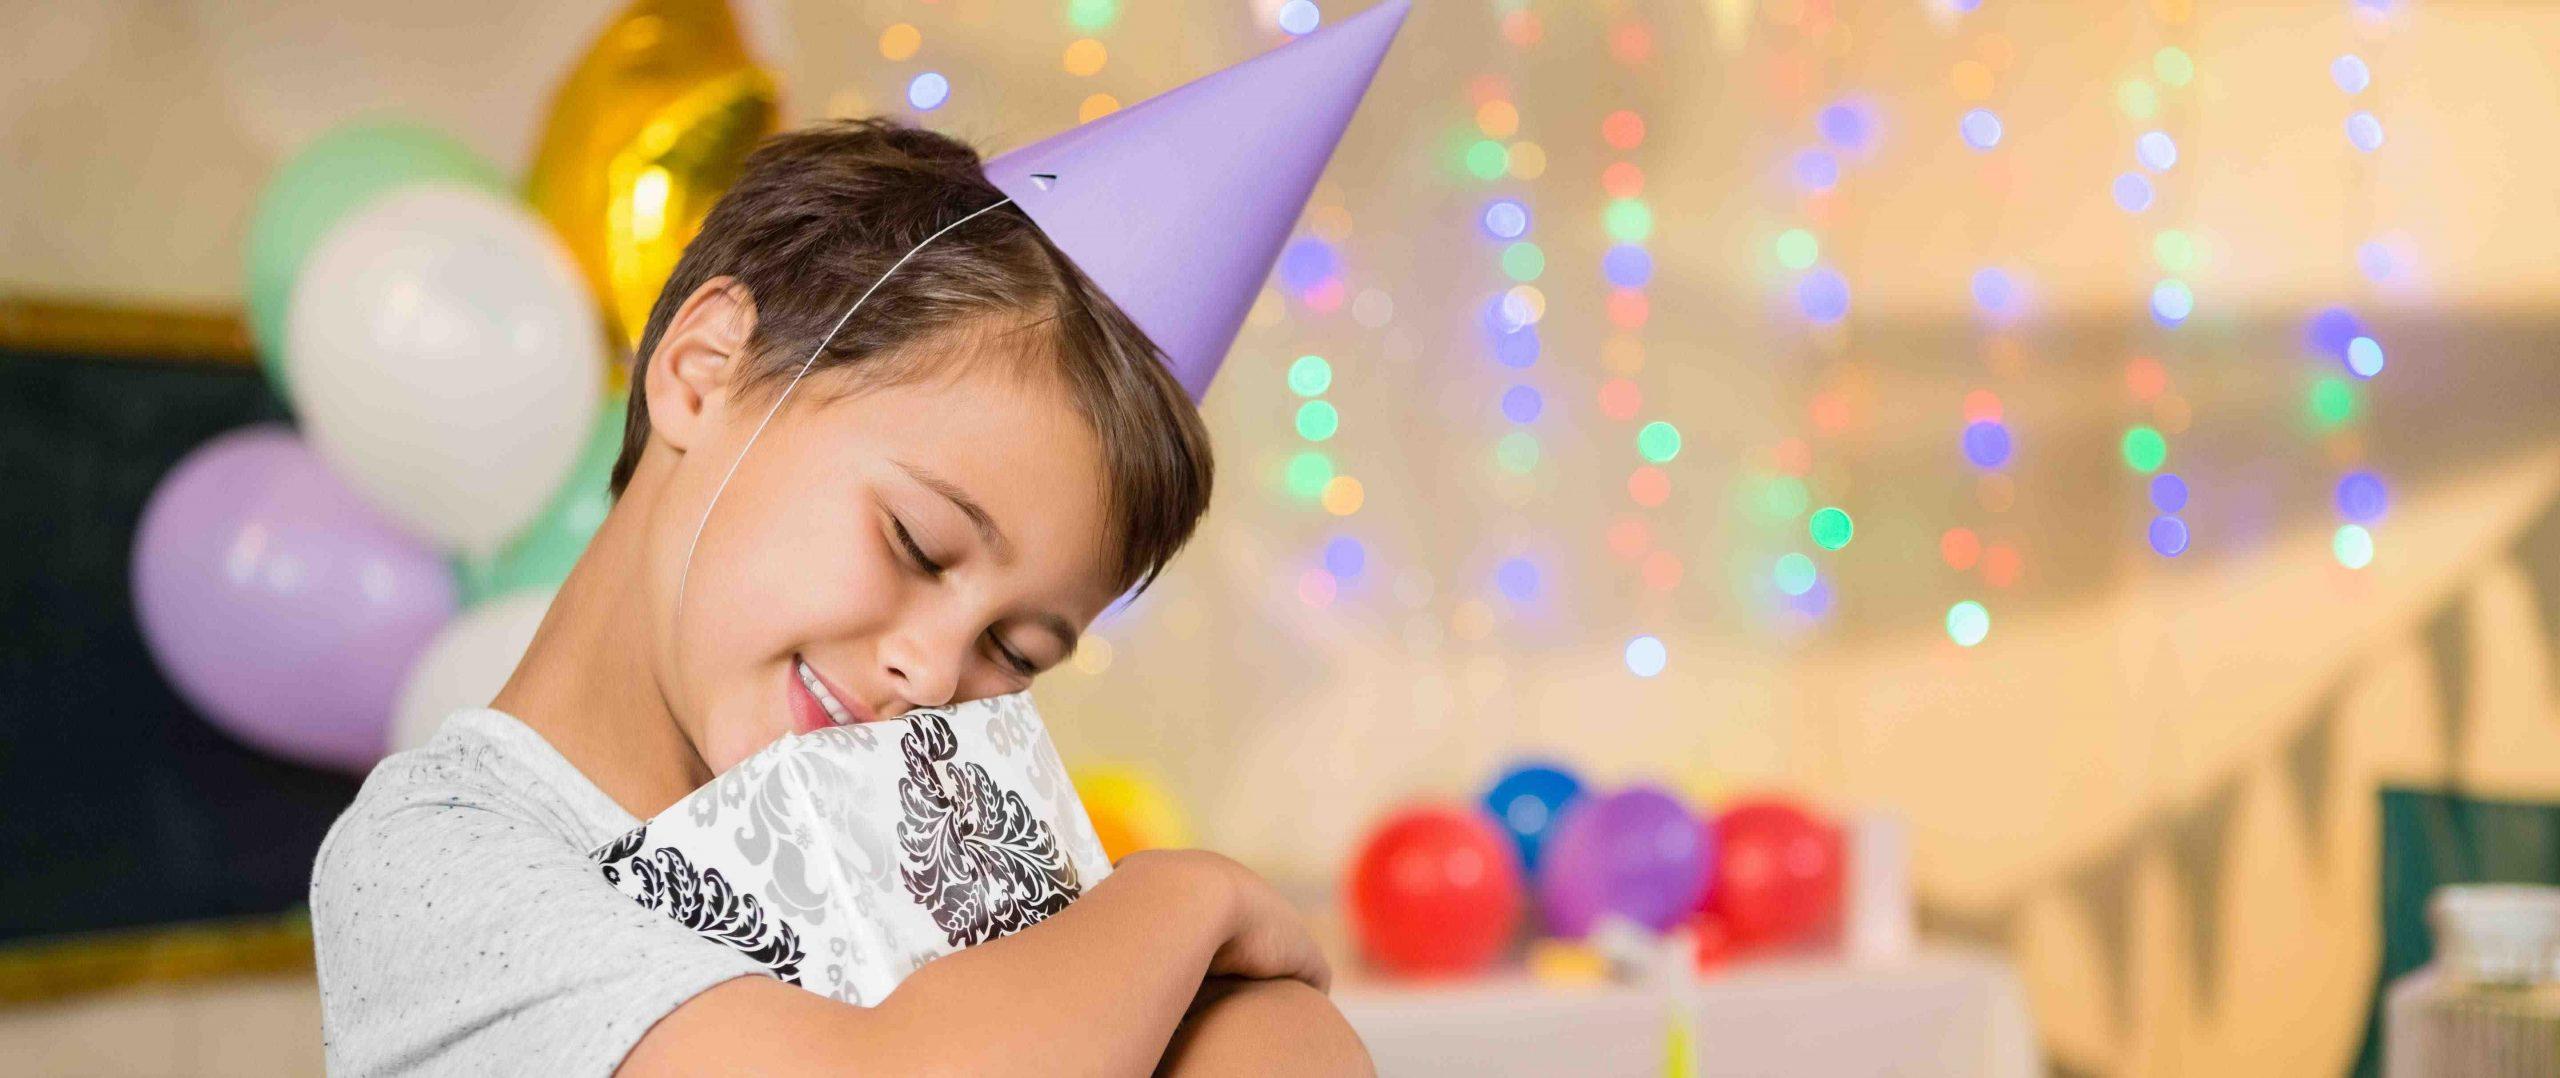 Comment occuper un garçon de 8 ans ?